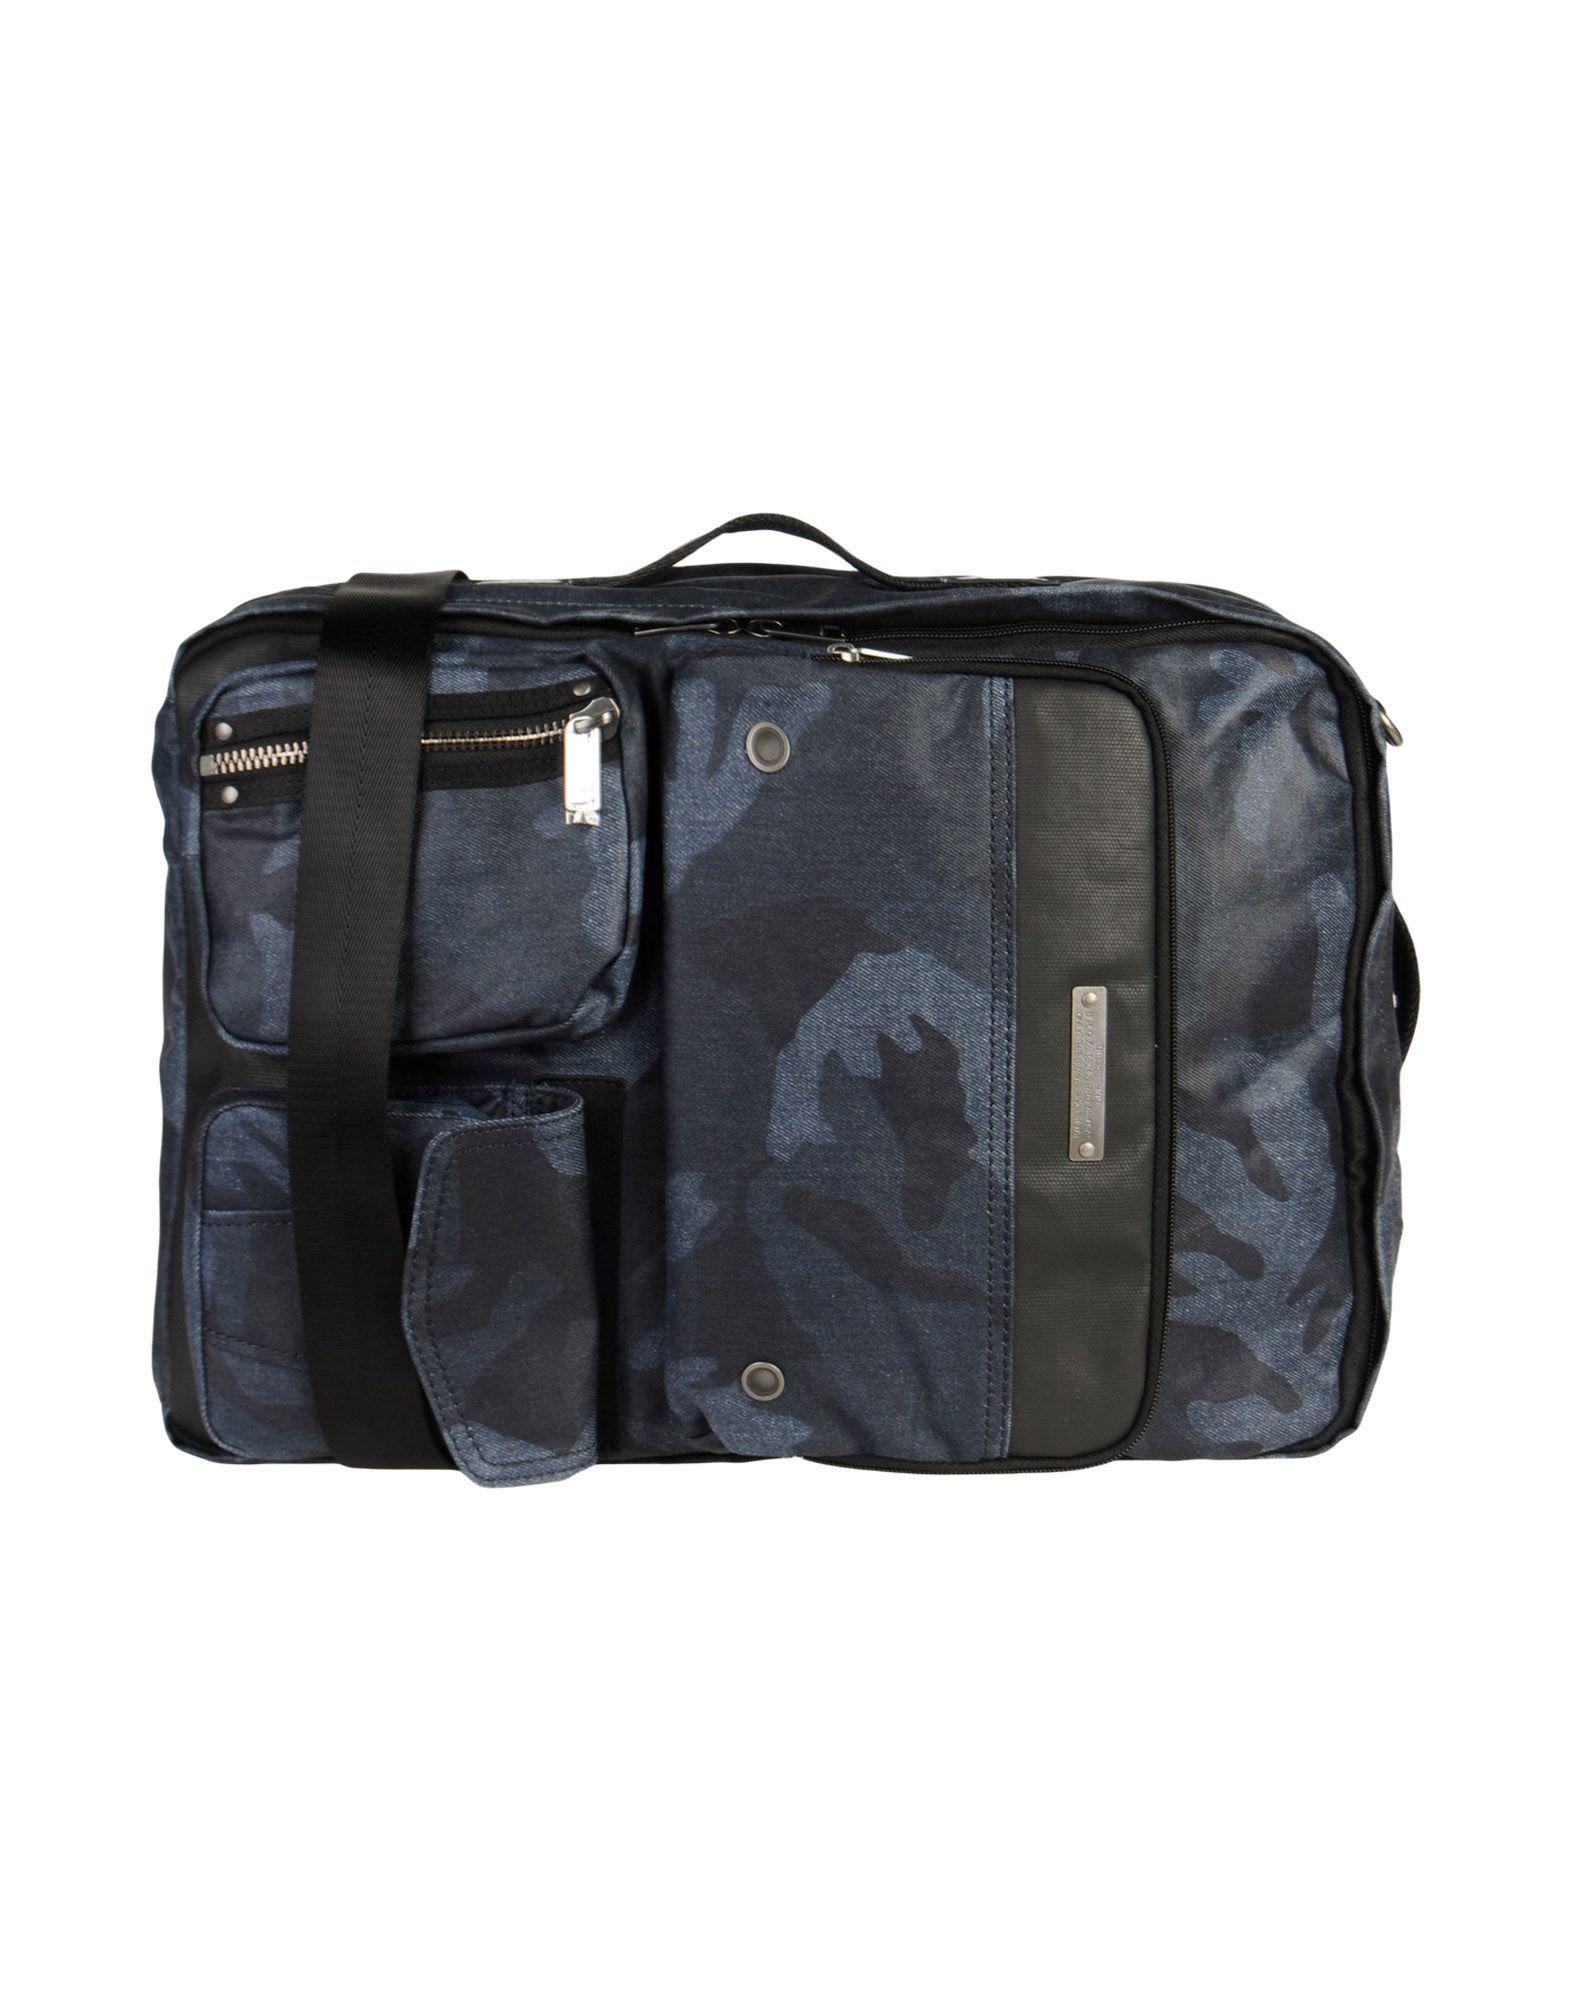 DIESEL Деловые сумки orciani деловые сумки